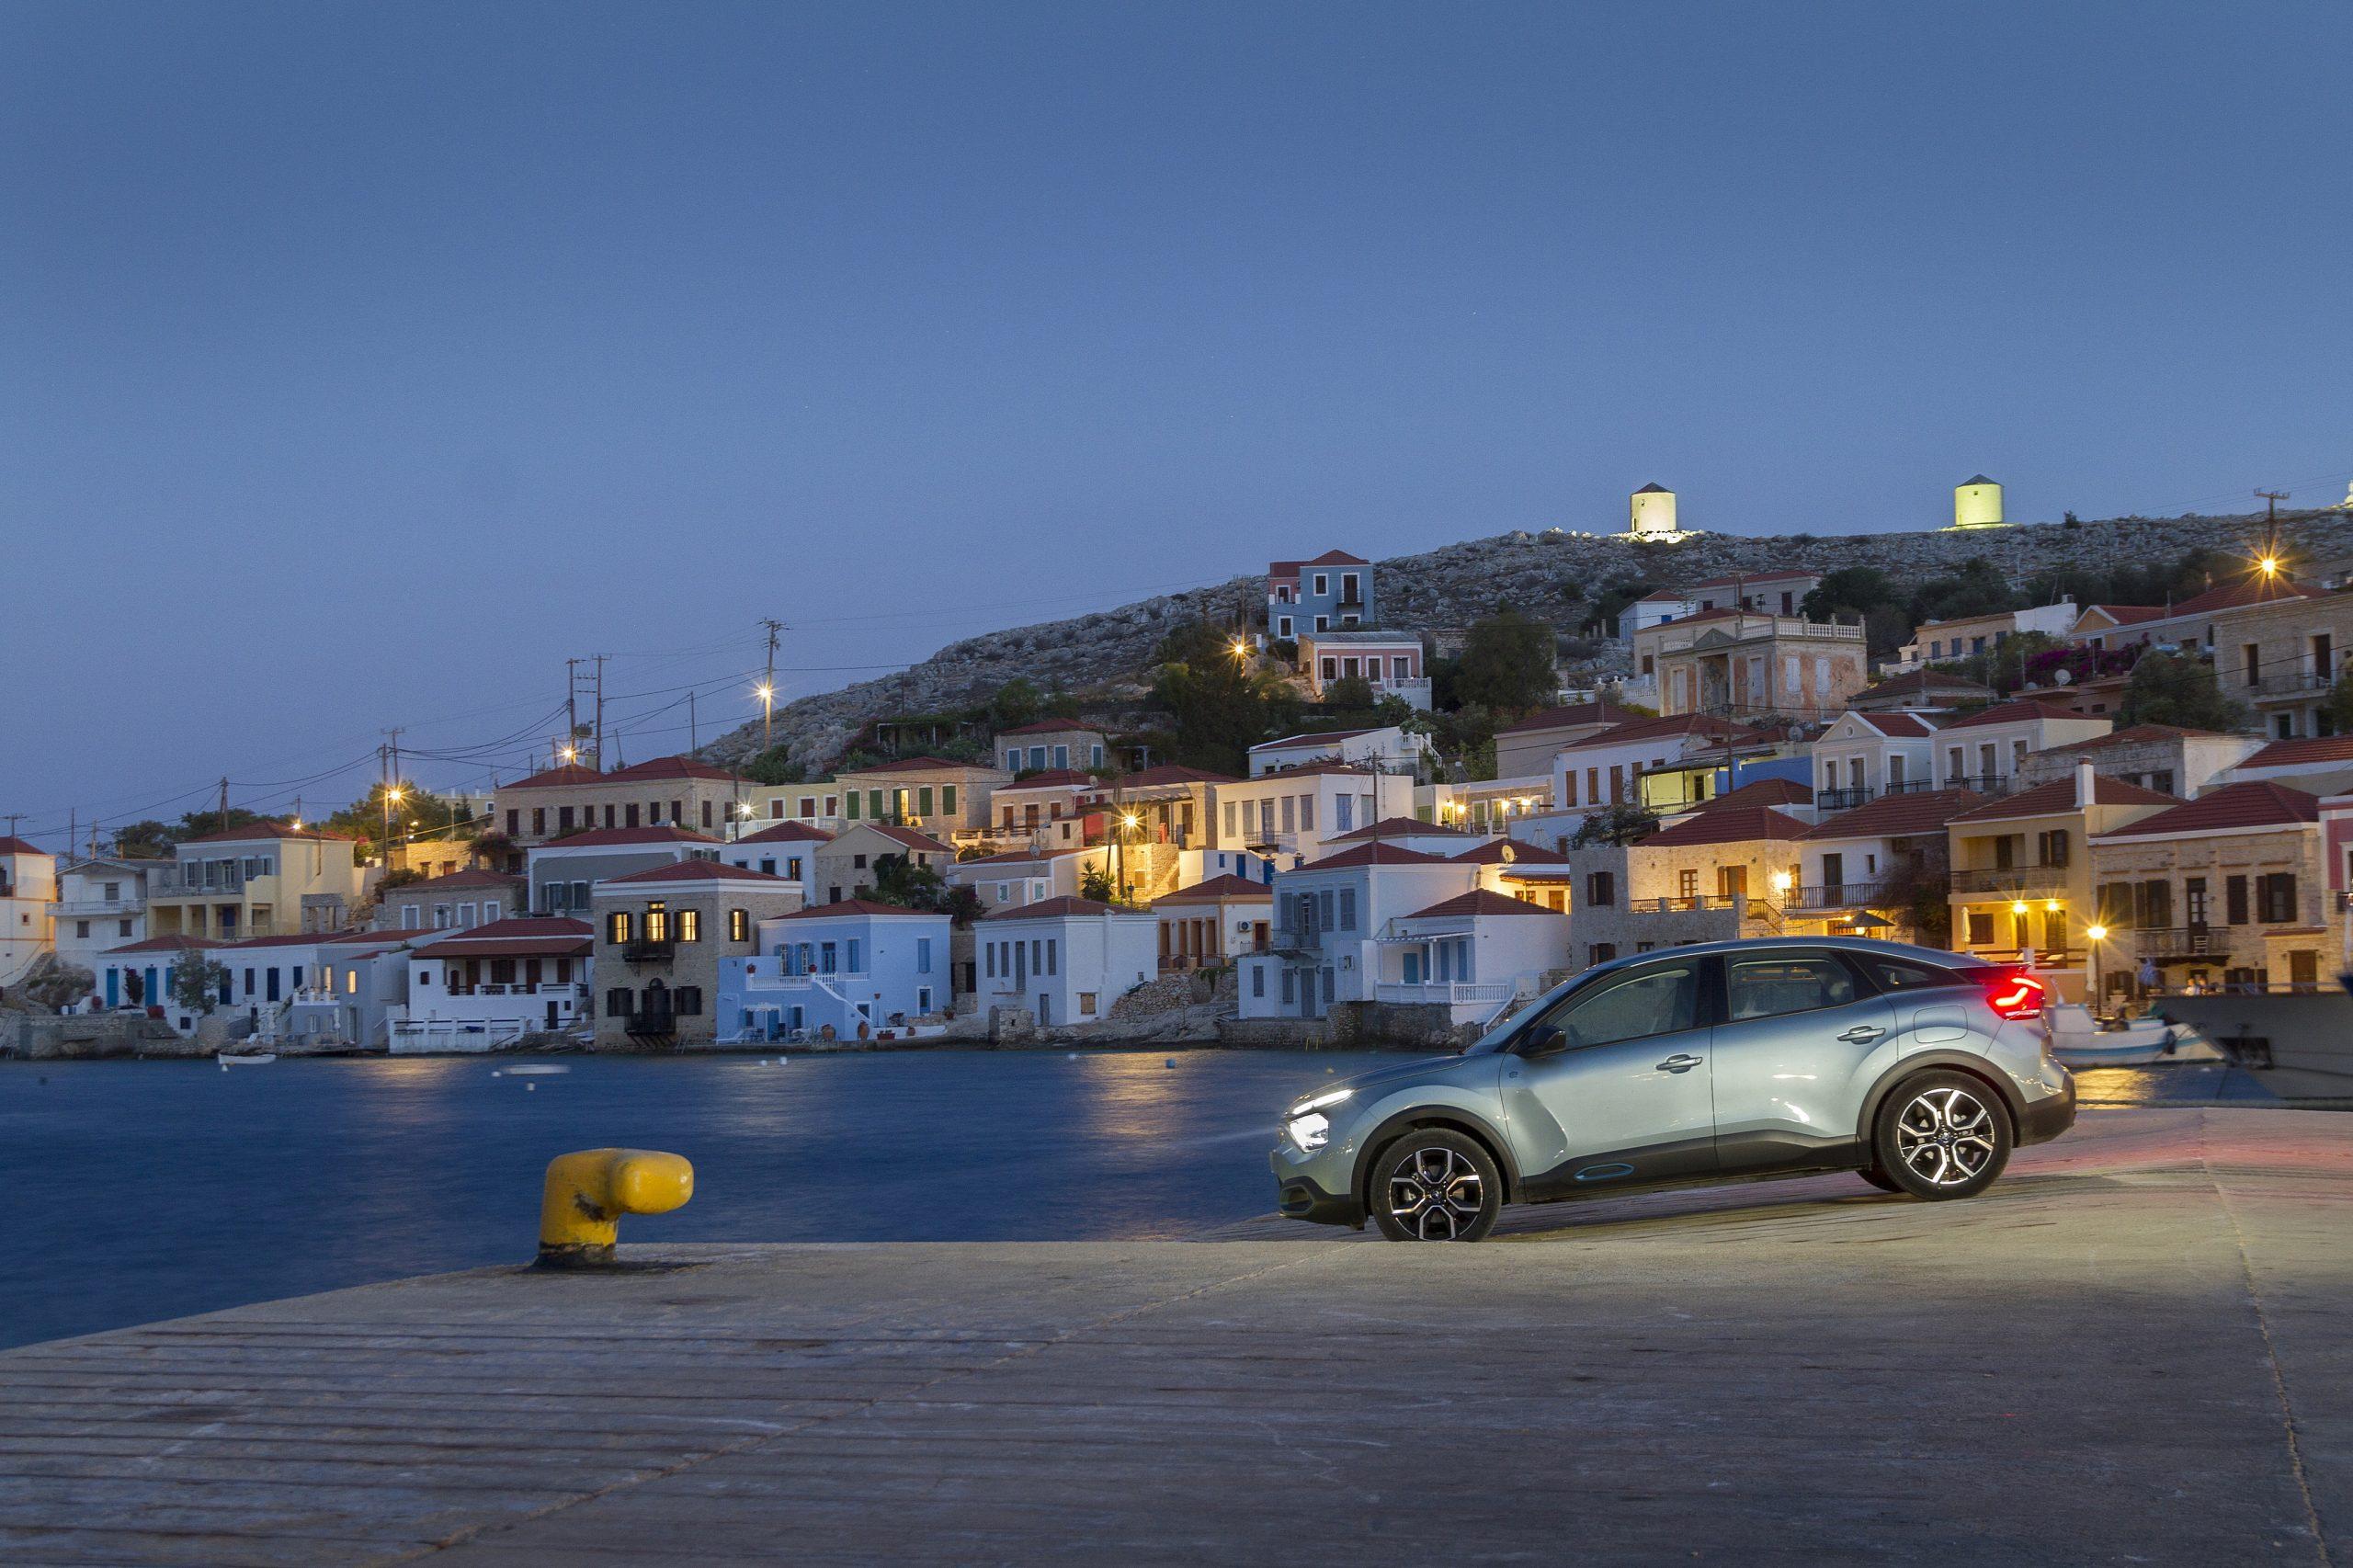 "CITROEN C4 C CROSSS HALKI1 scaled Το σχέδιο της Citroën για να γίνει η Χάλκη ""έξυπνο και πράσινο"" νησί citroen, Electric cars, zblog, ηλεκτρικά, κινουμαι ηλεκτρικα, Όμιλος Συγγελίδη"